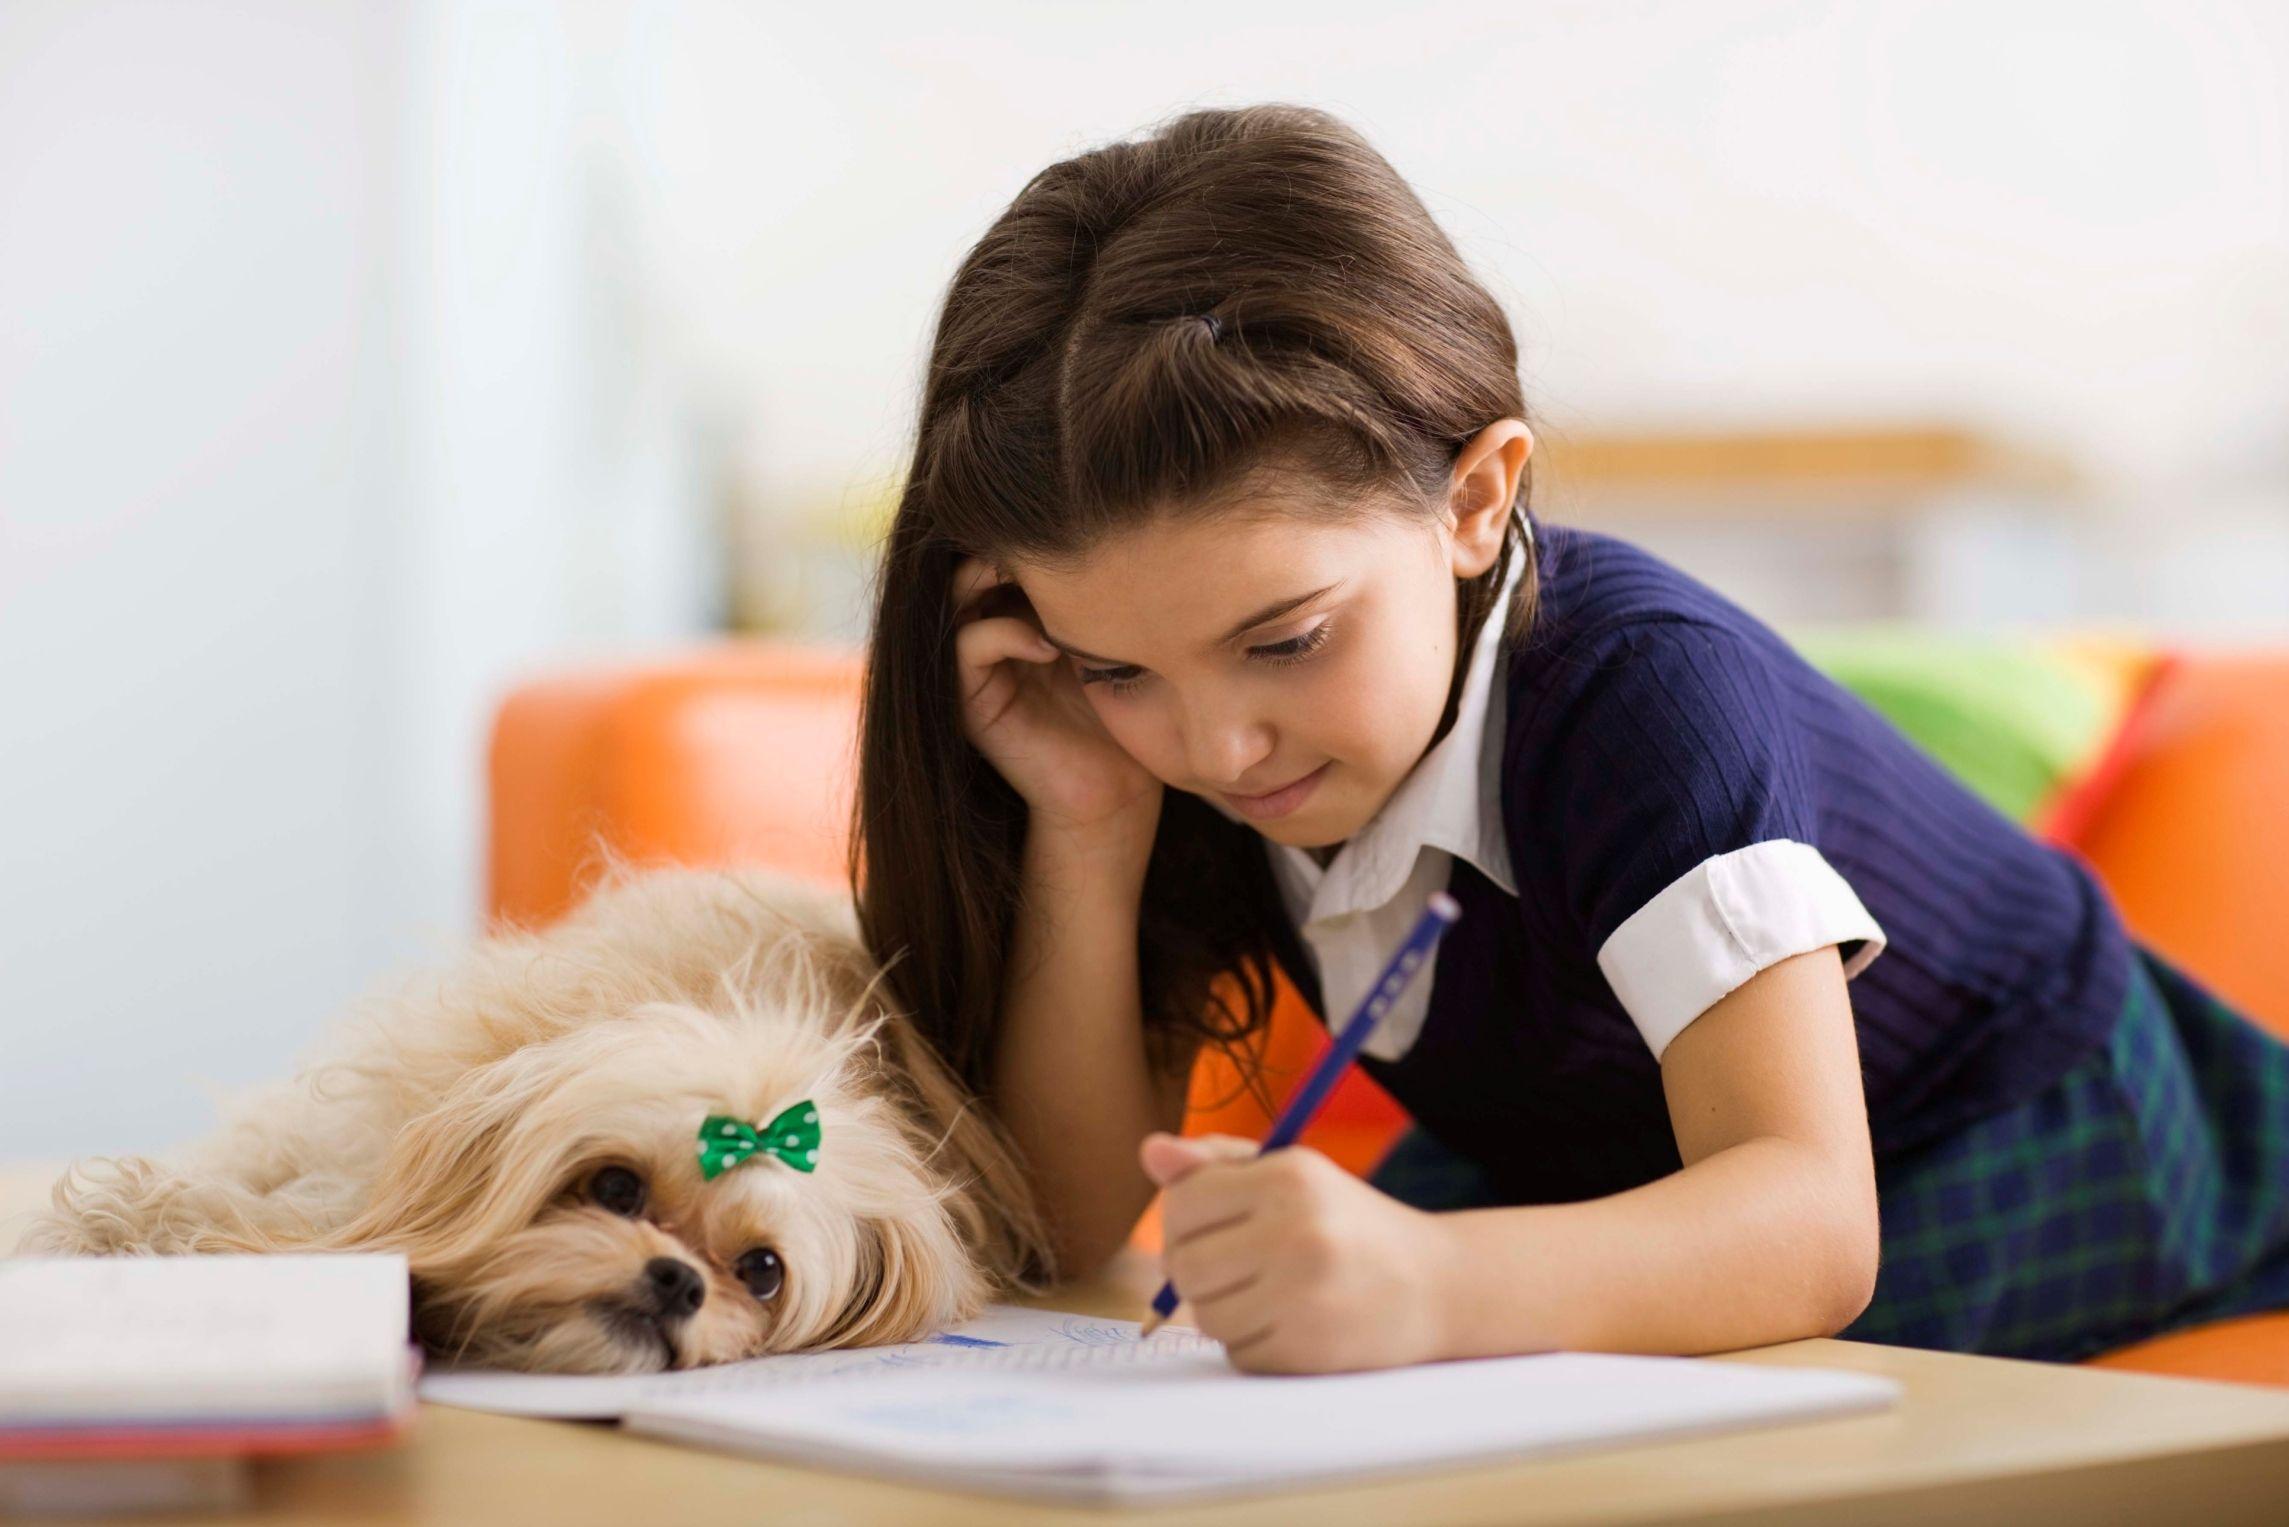 5. Fokus perkembangan studi formal